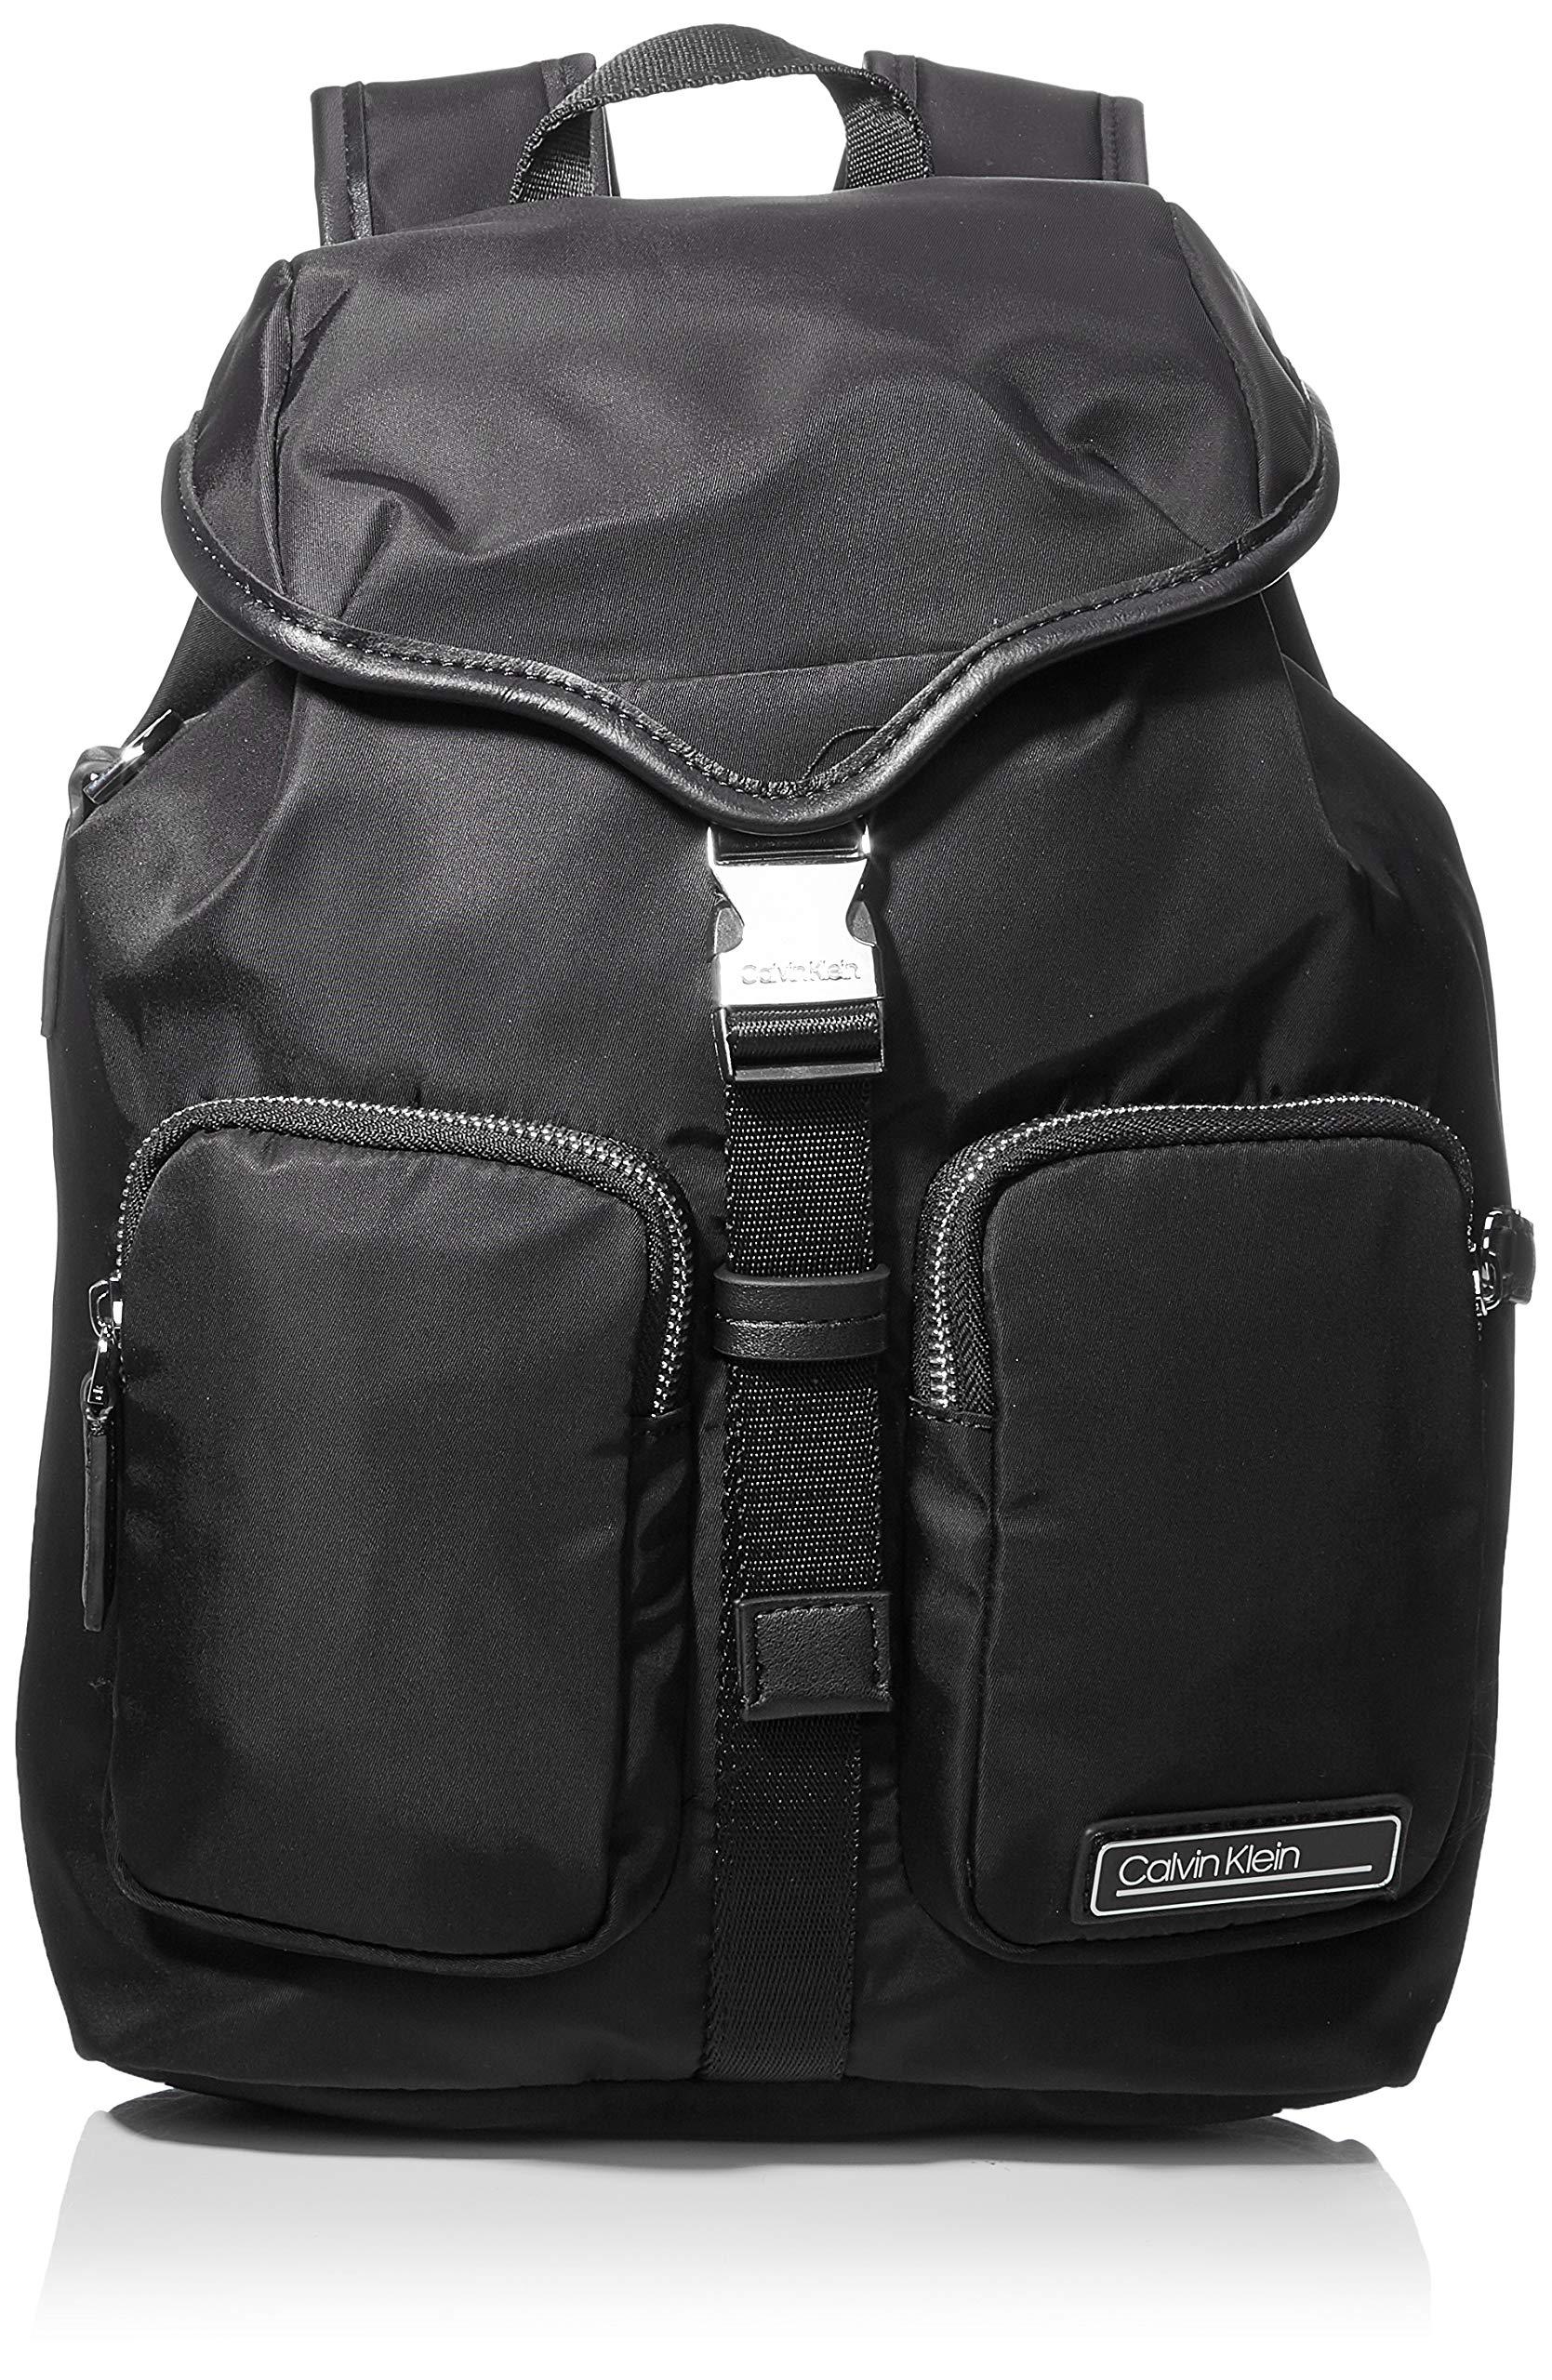 BackpackSacs Bandoulière Cmw Klein Primary FemmeNoirblack1x1x1 Calvin H L X JcTK1lF